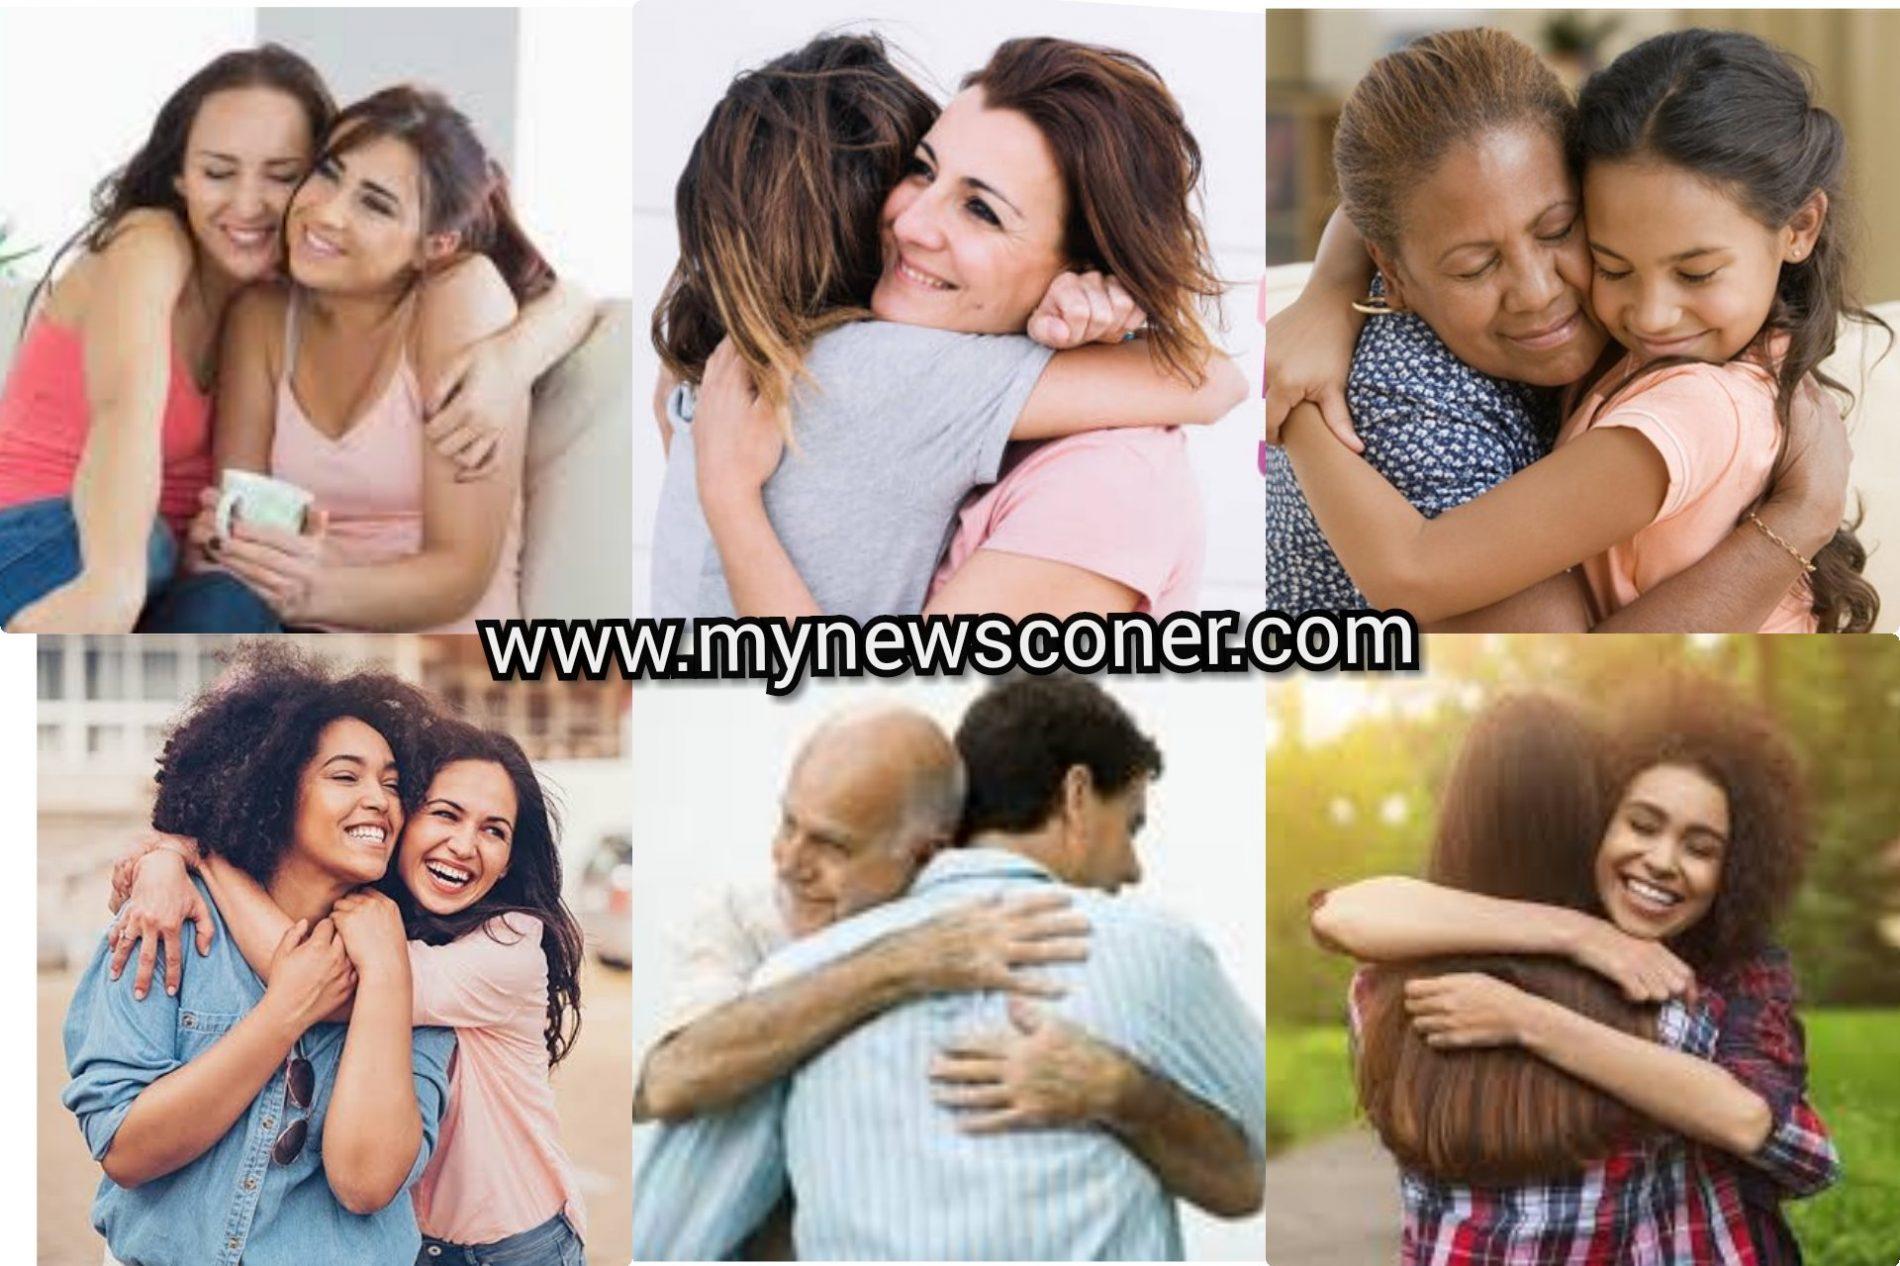 Why Human Needs Hug, Benefits Revealed